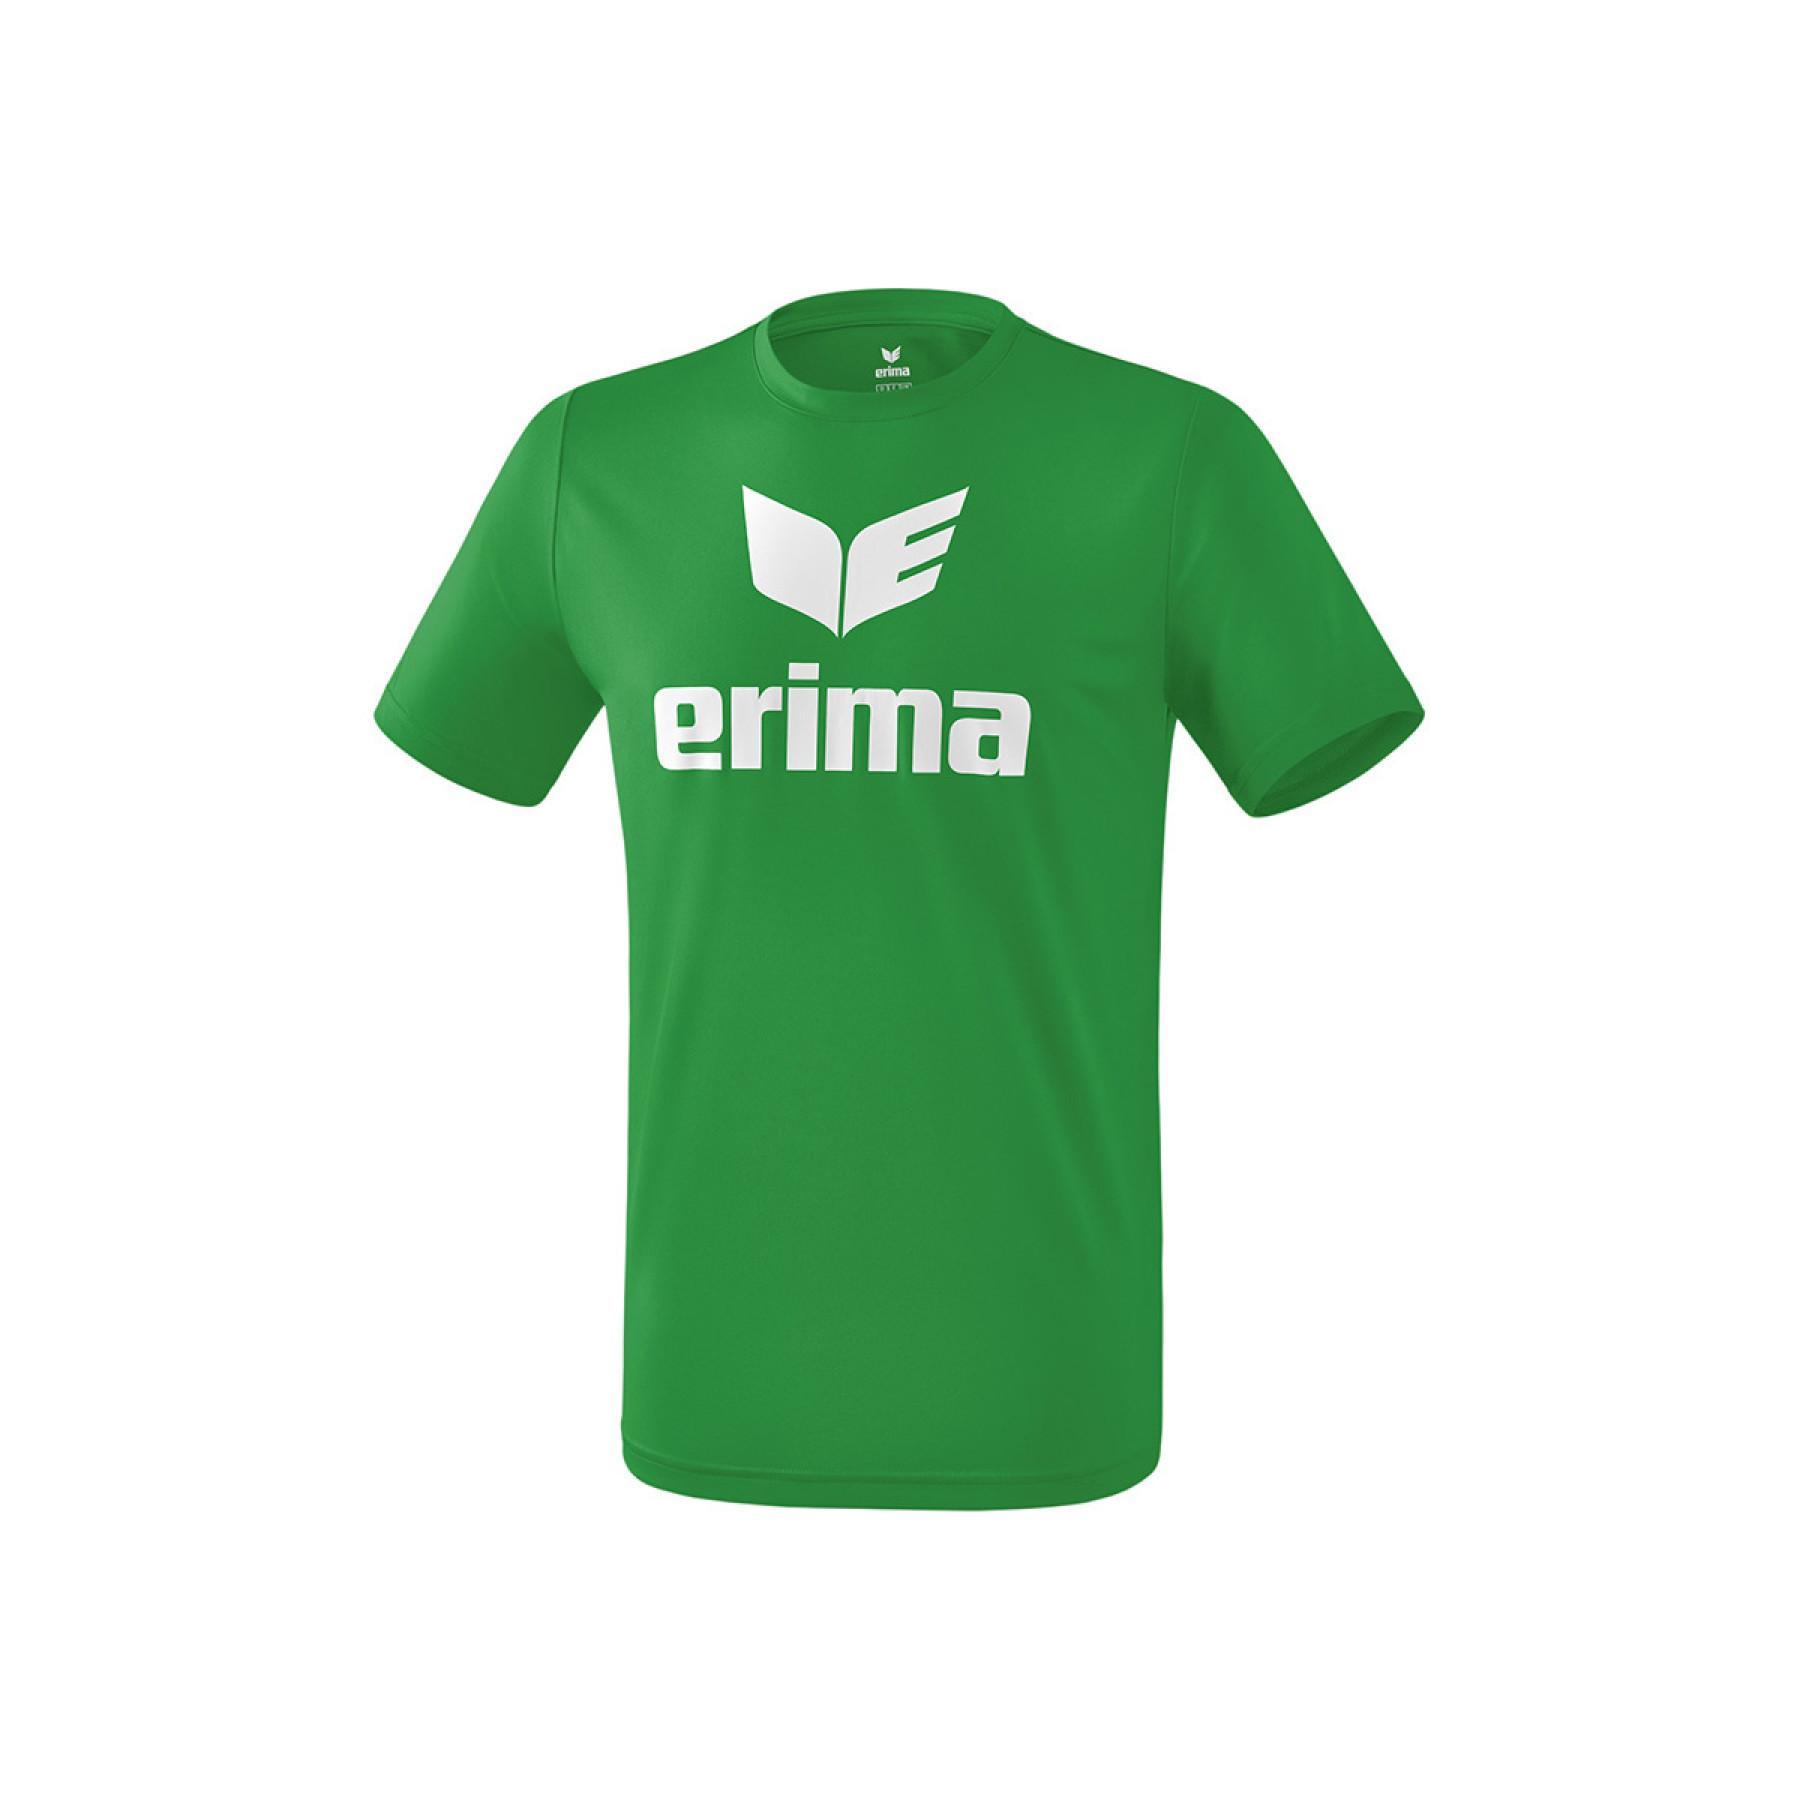 Erima Training Club 1900 2.0 T-Shirt Training Shirt Mens Kids Green